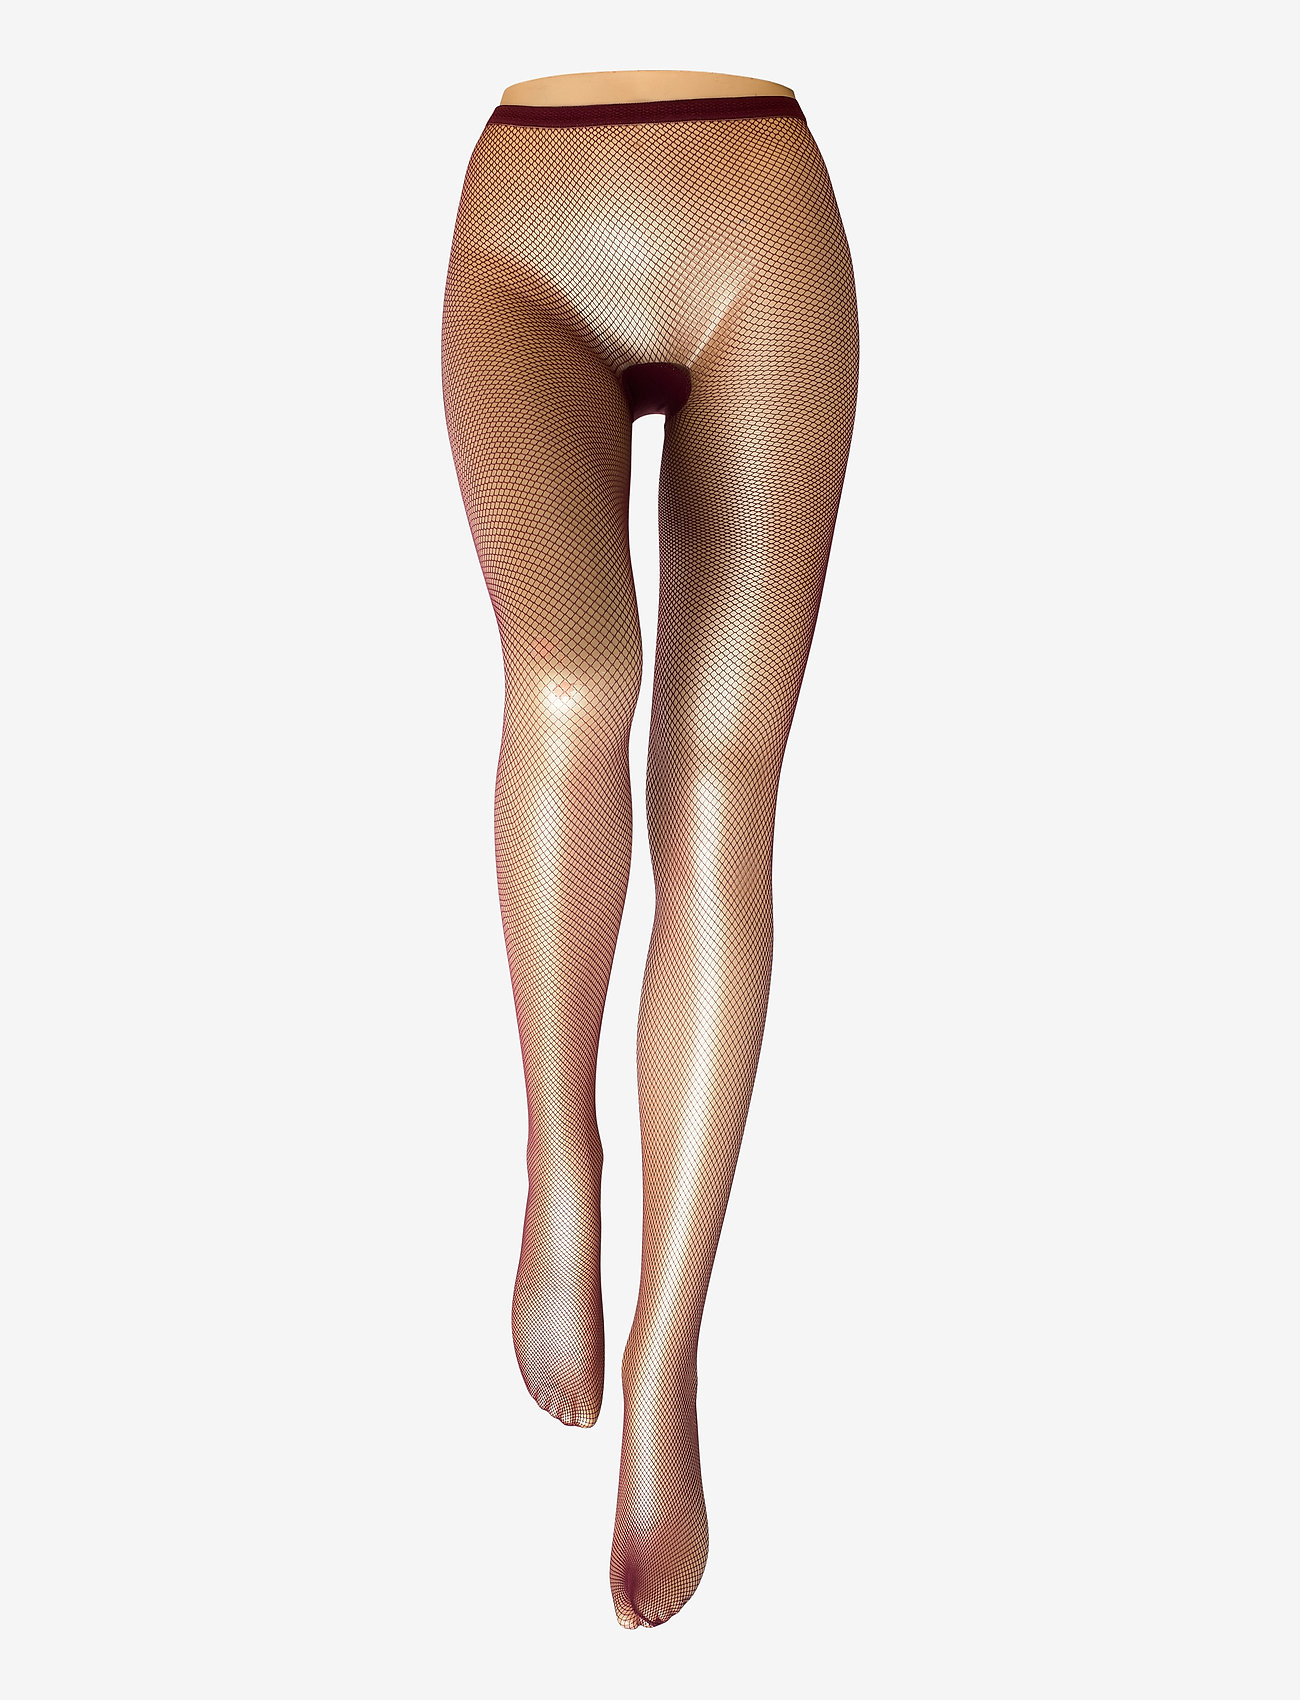 Swedish Stockings - Liv net tights micro net - panty's - wine - 1